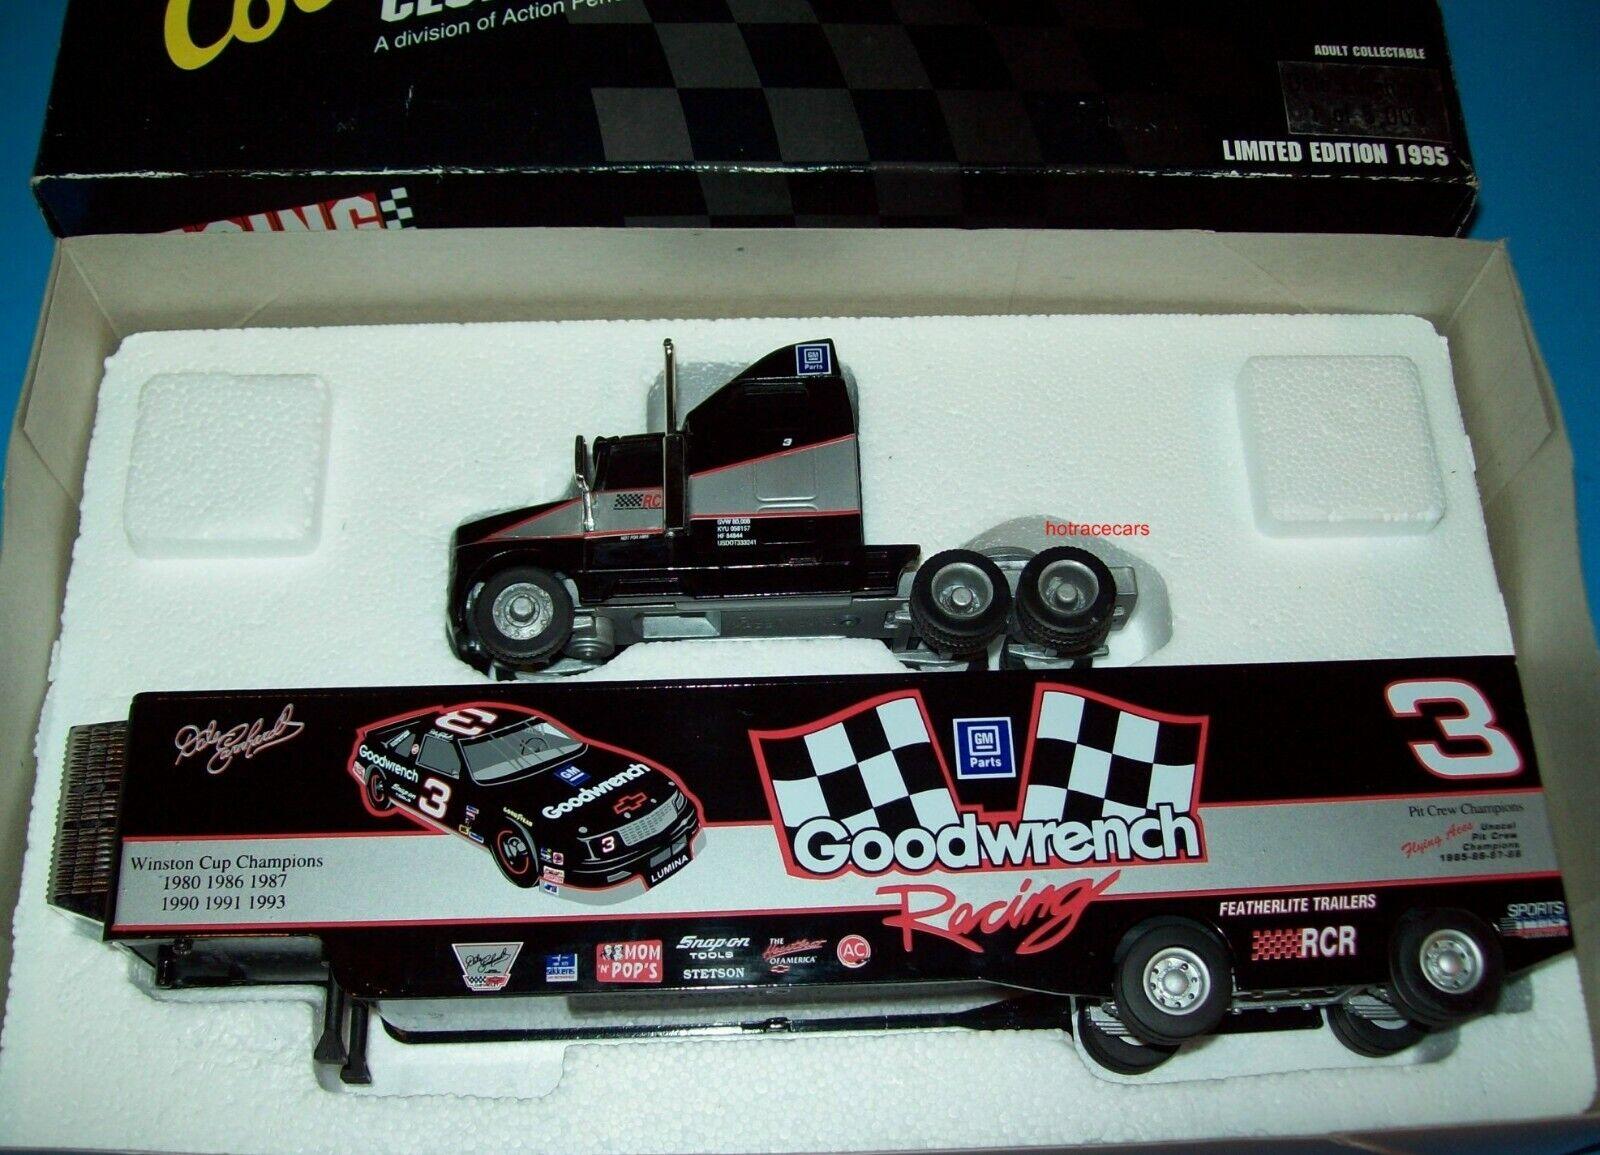 Dale Earnhardt 1994 Goodwrench  3 1 64 NASCAR Hauler Transporter Truck Trailer